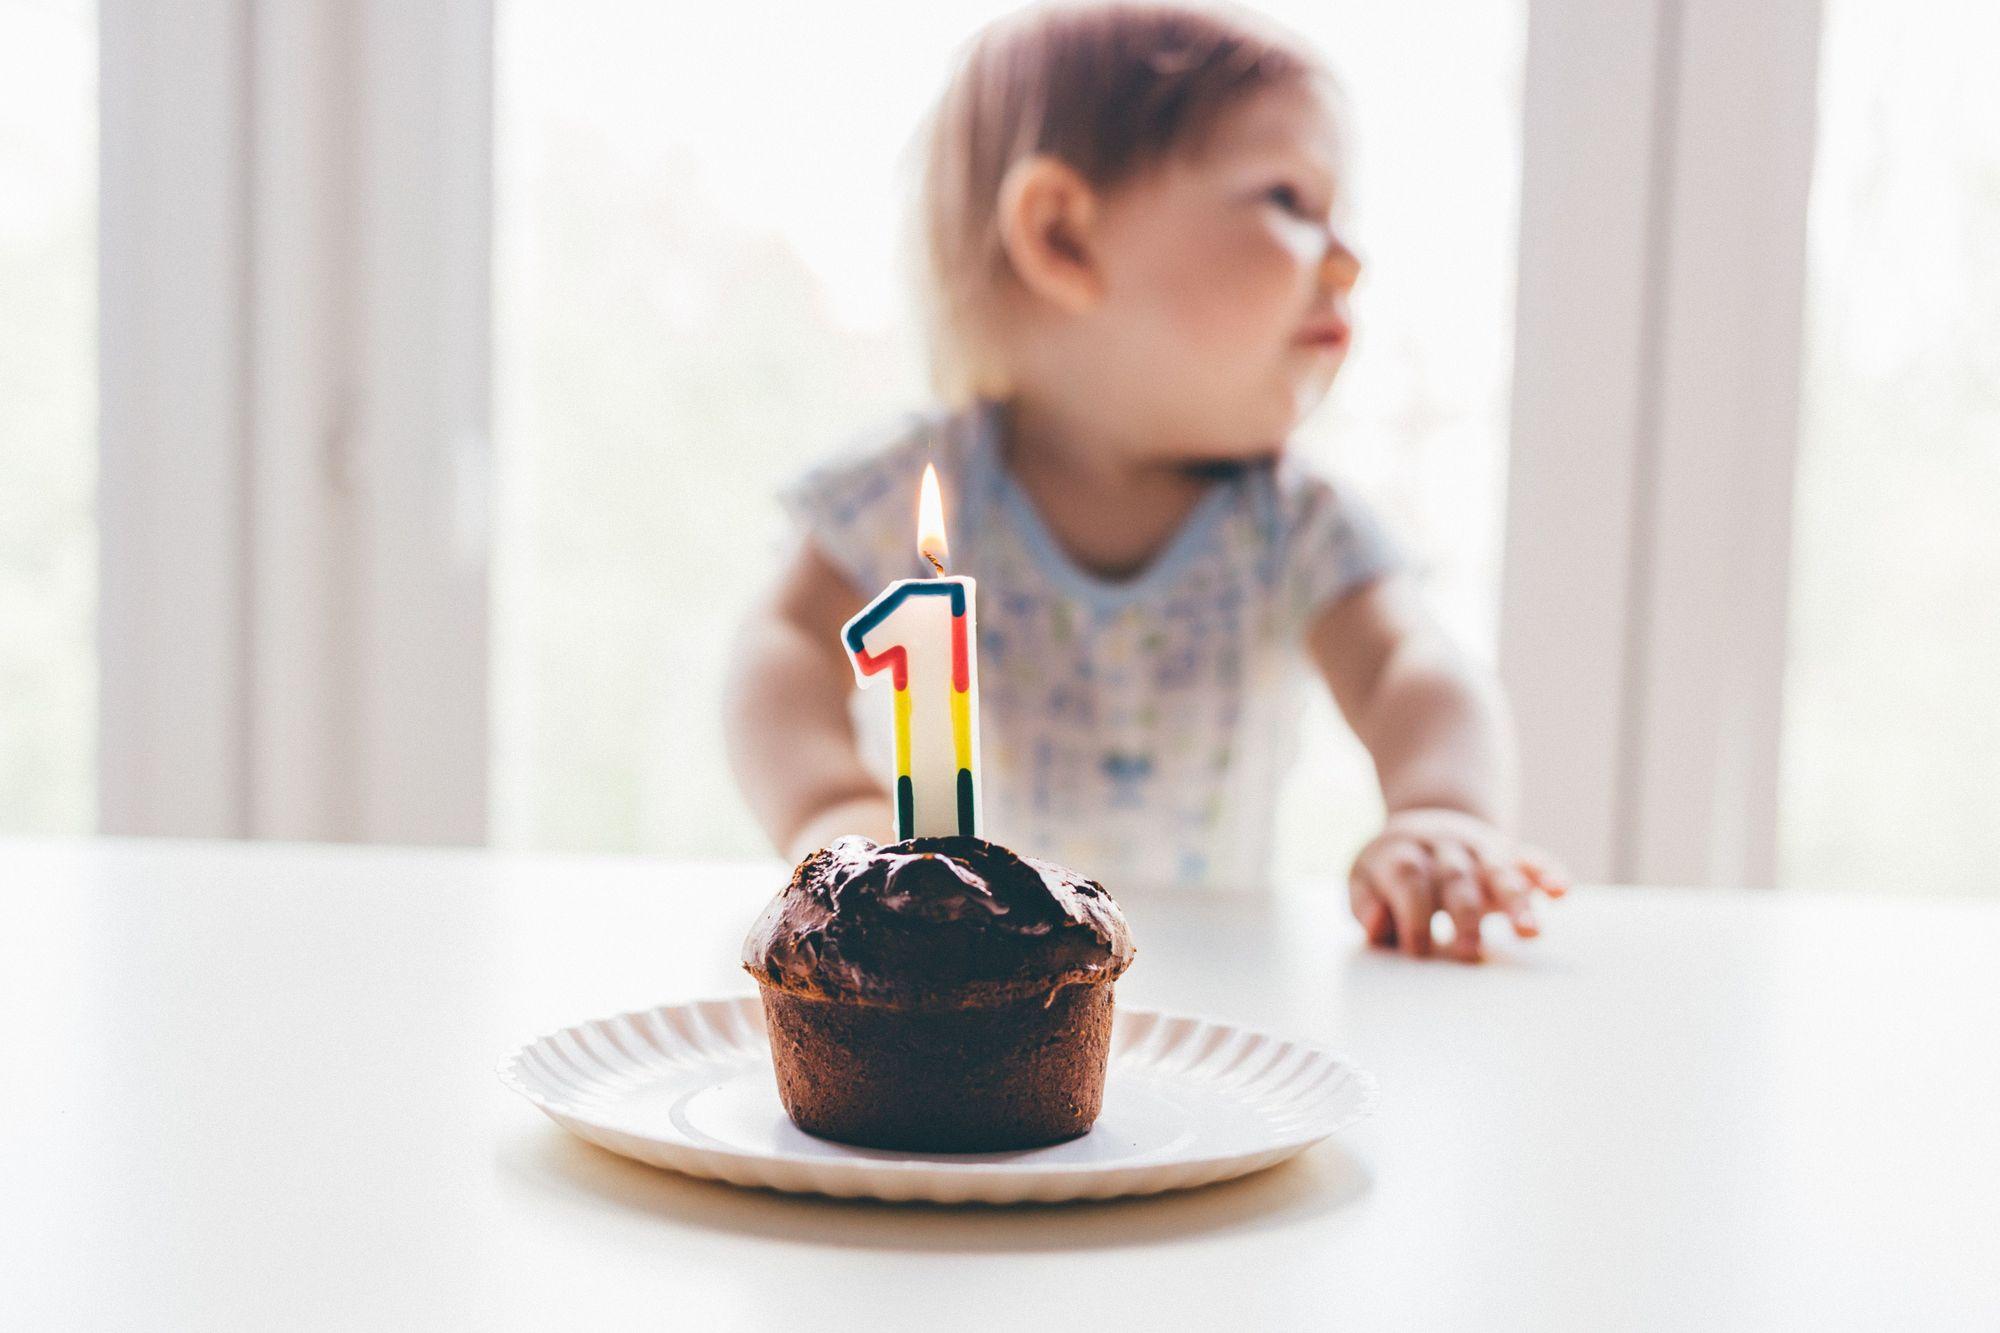 1st Birthday Poem for a Baby Boy